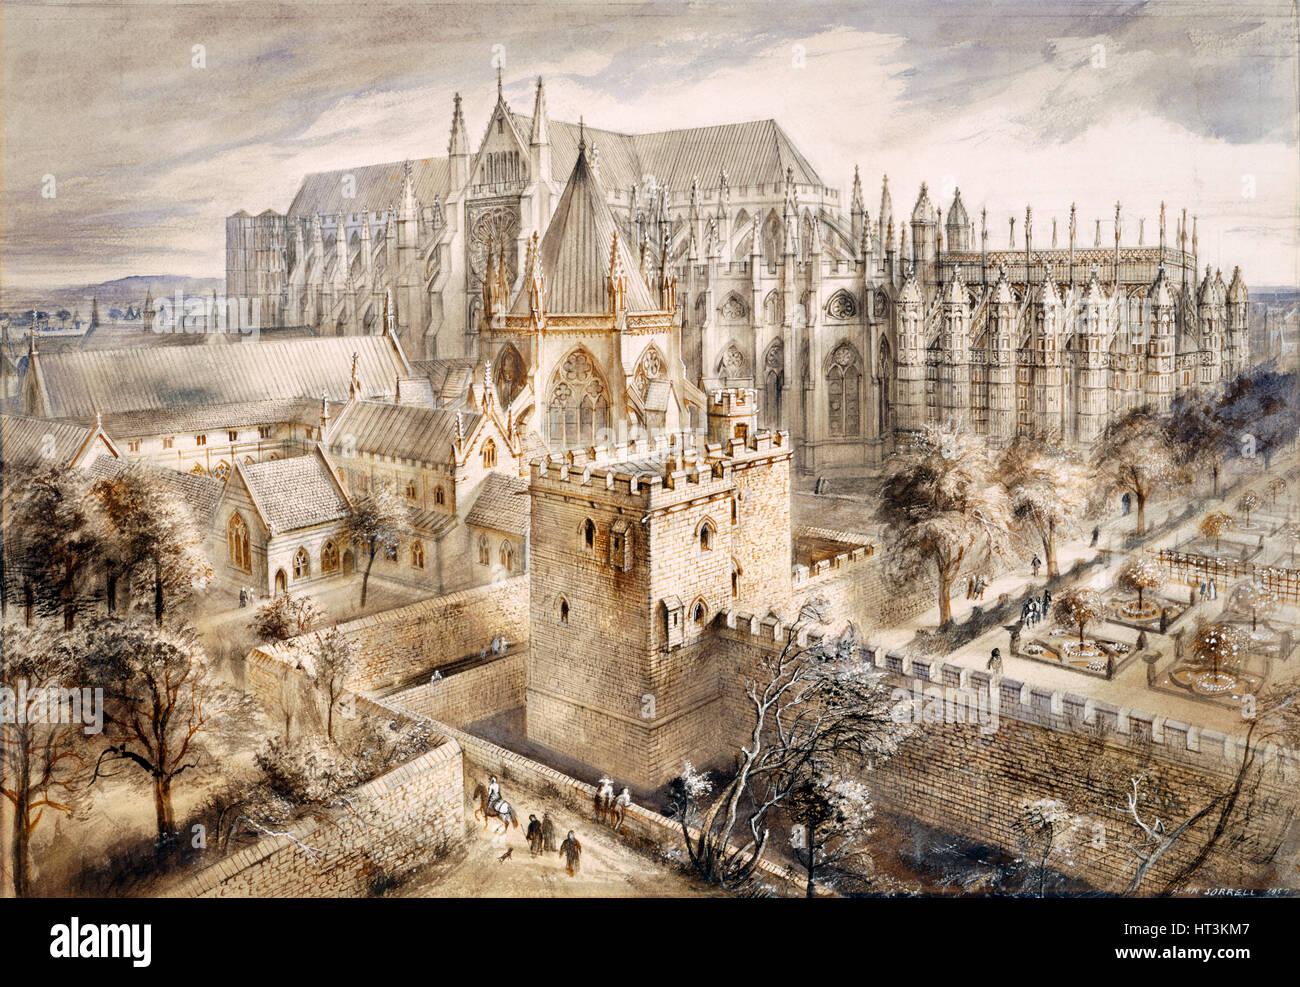 Jewel Tower, London, c14th-15th century, (1990-2010). Artist: Alan Ernest Sorrell. - Stock Image